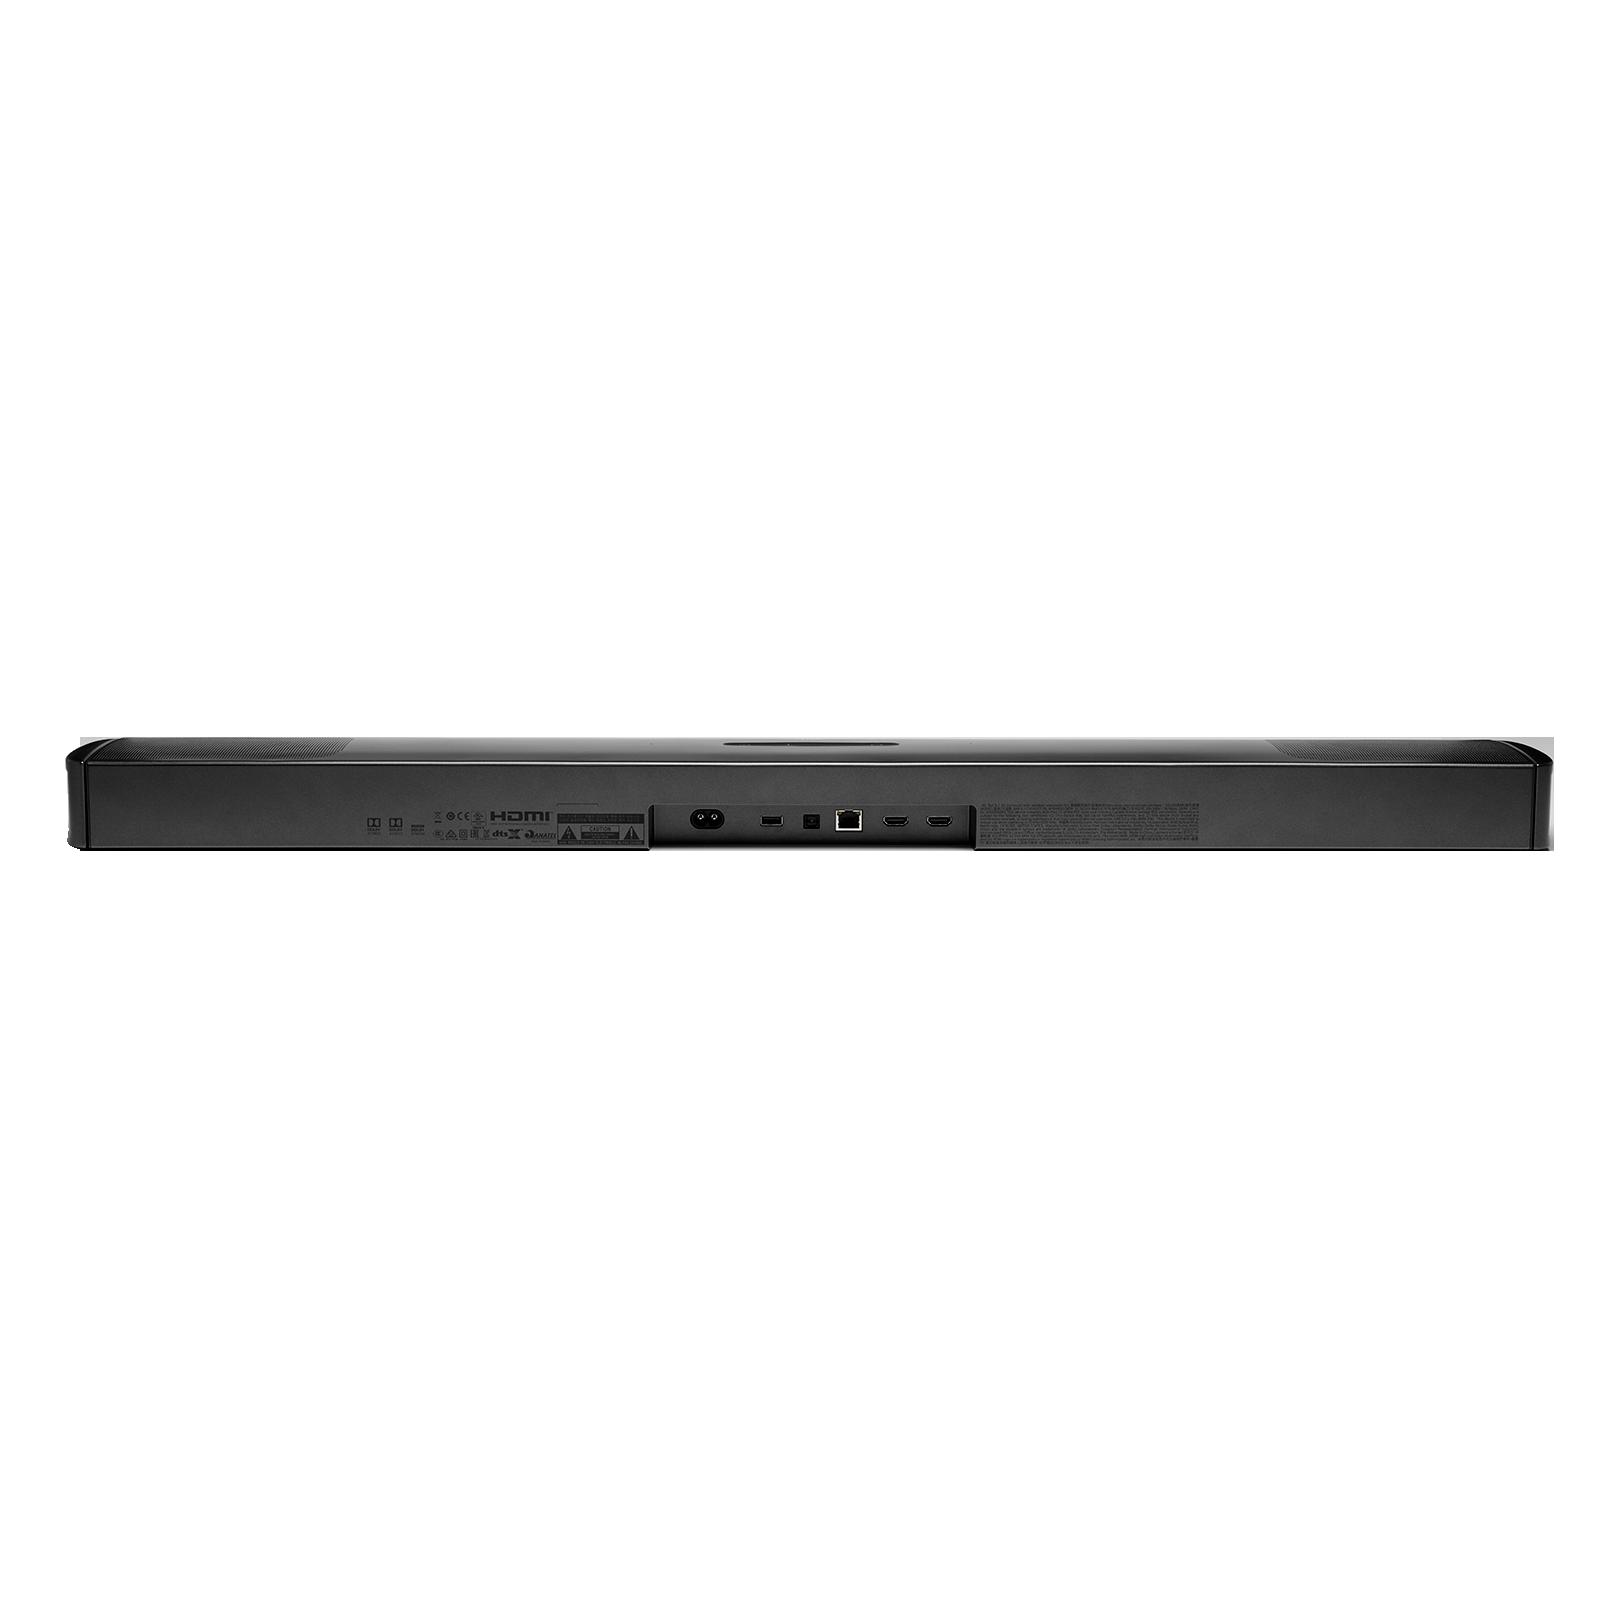 JBL BAR 9.1 True Wireless Surround with Dolby Atmos® - Black - Back